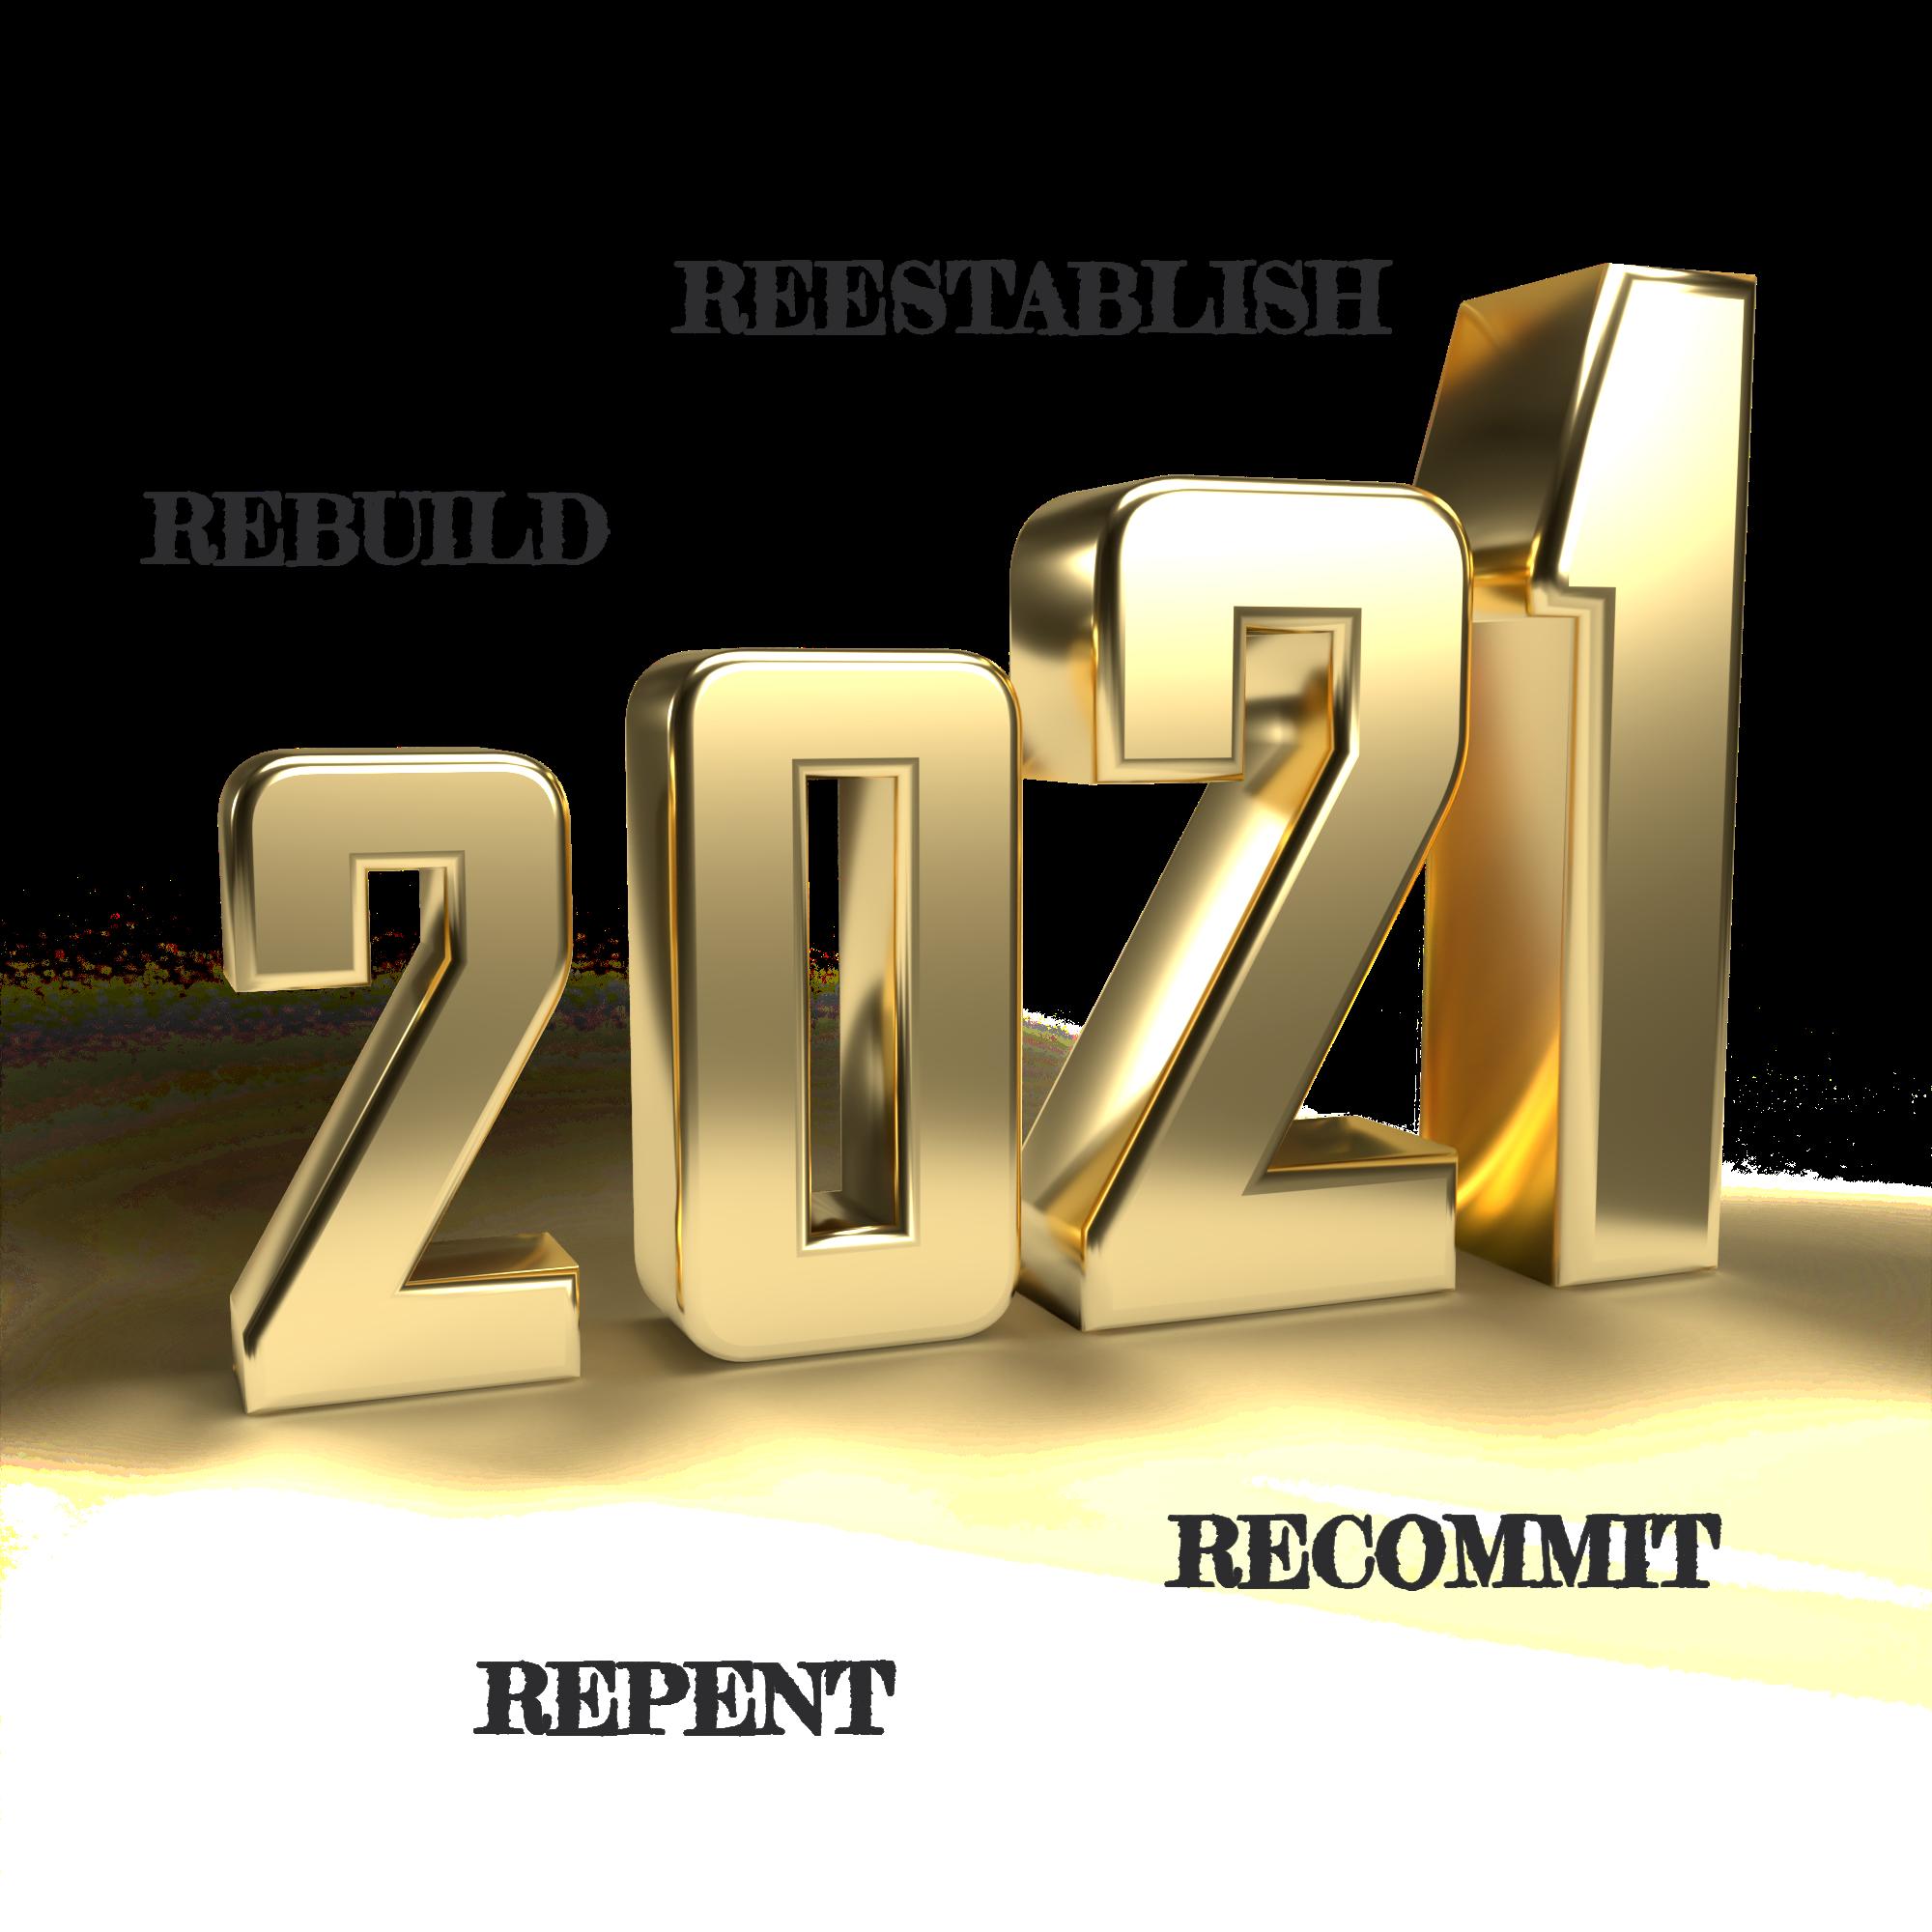 %E2%80%94Pngtree%E2%80%94festive%20illus